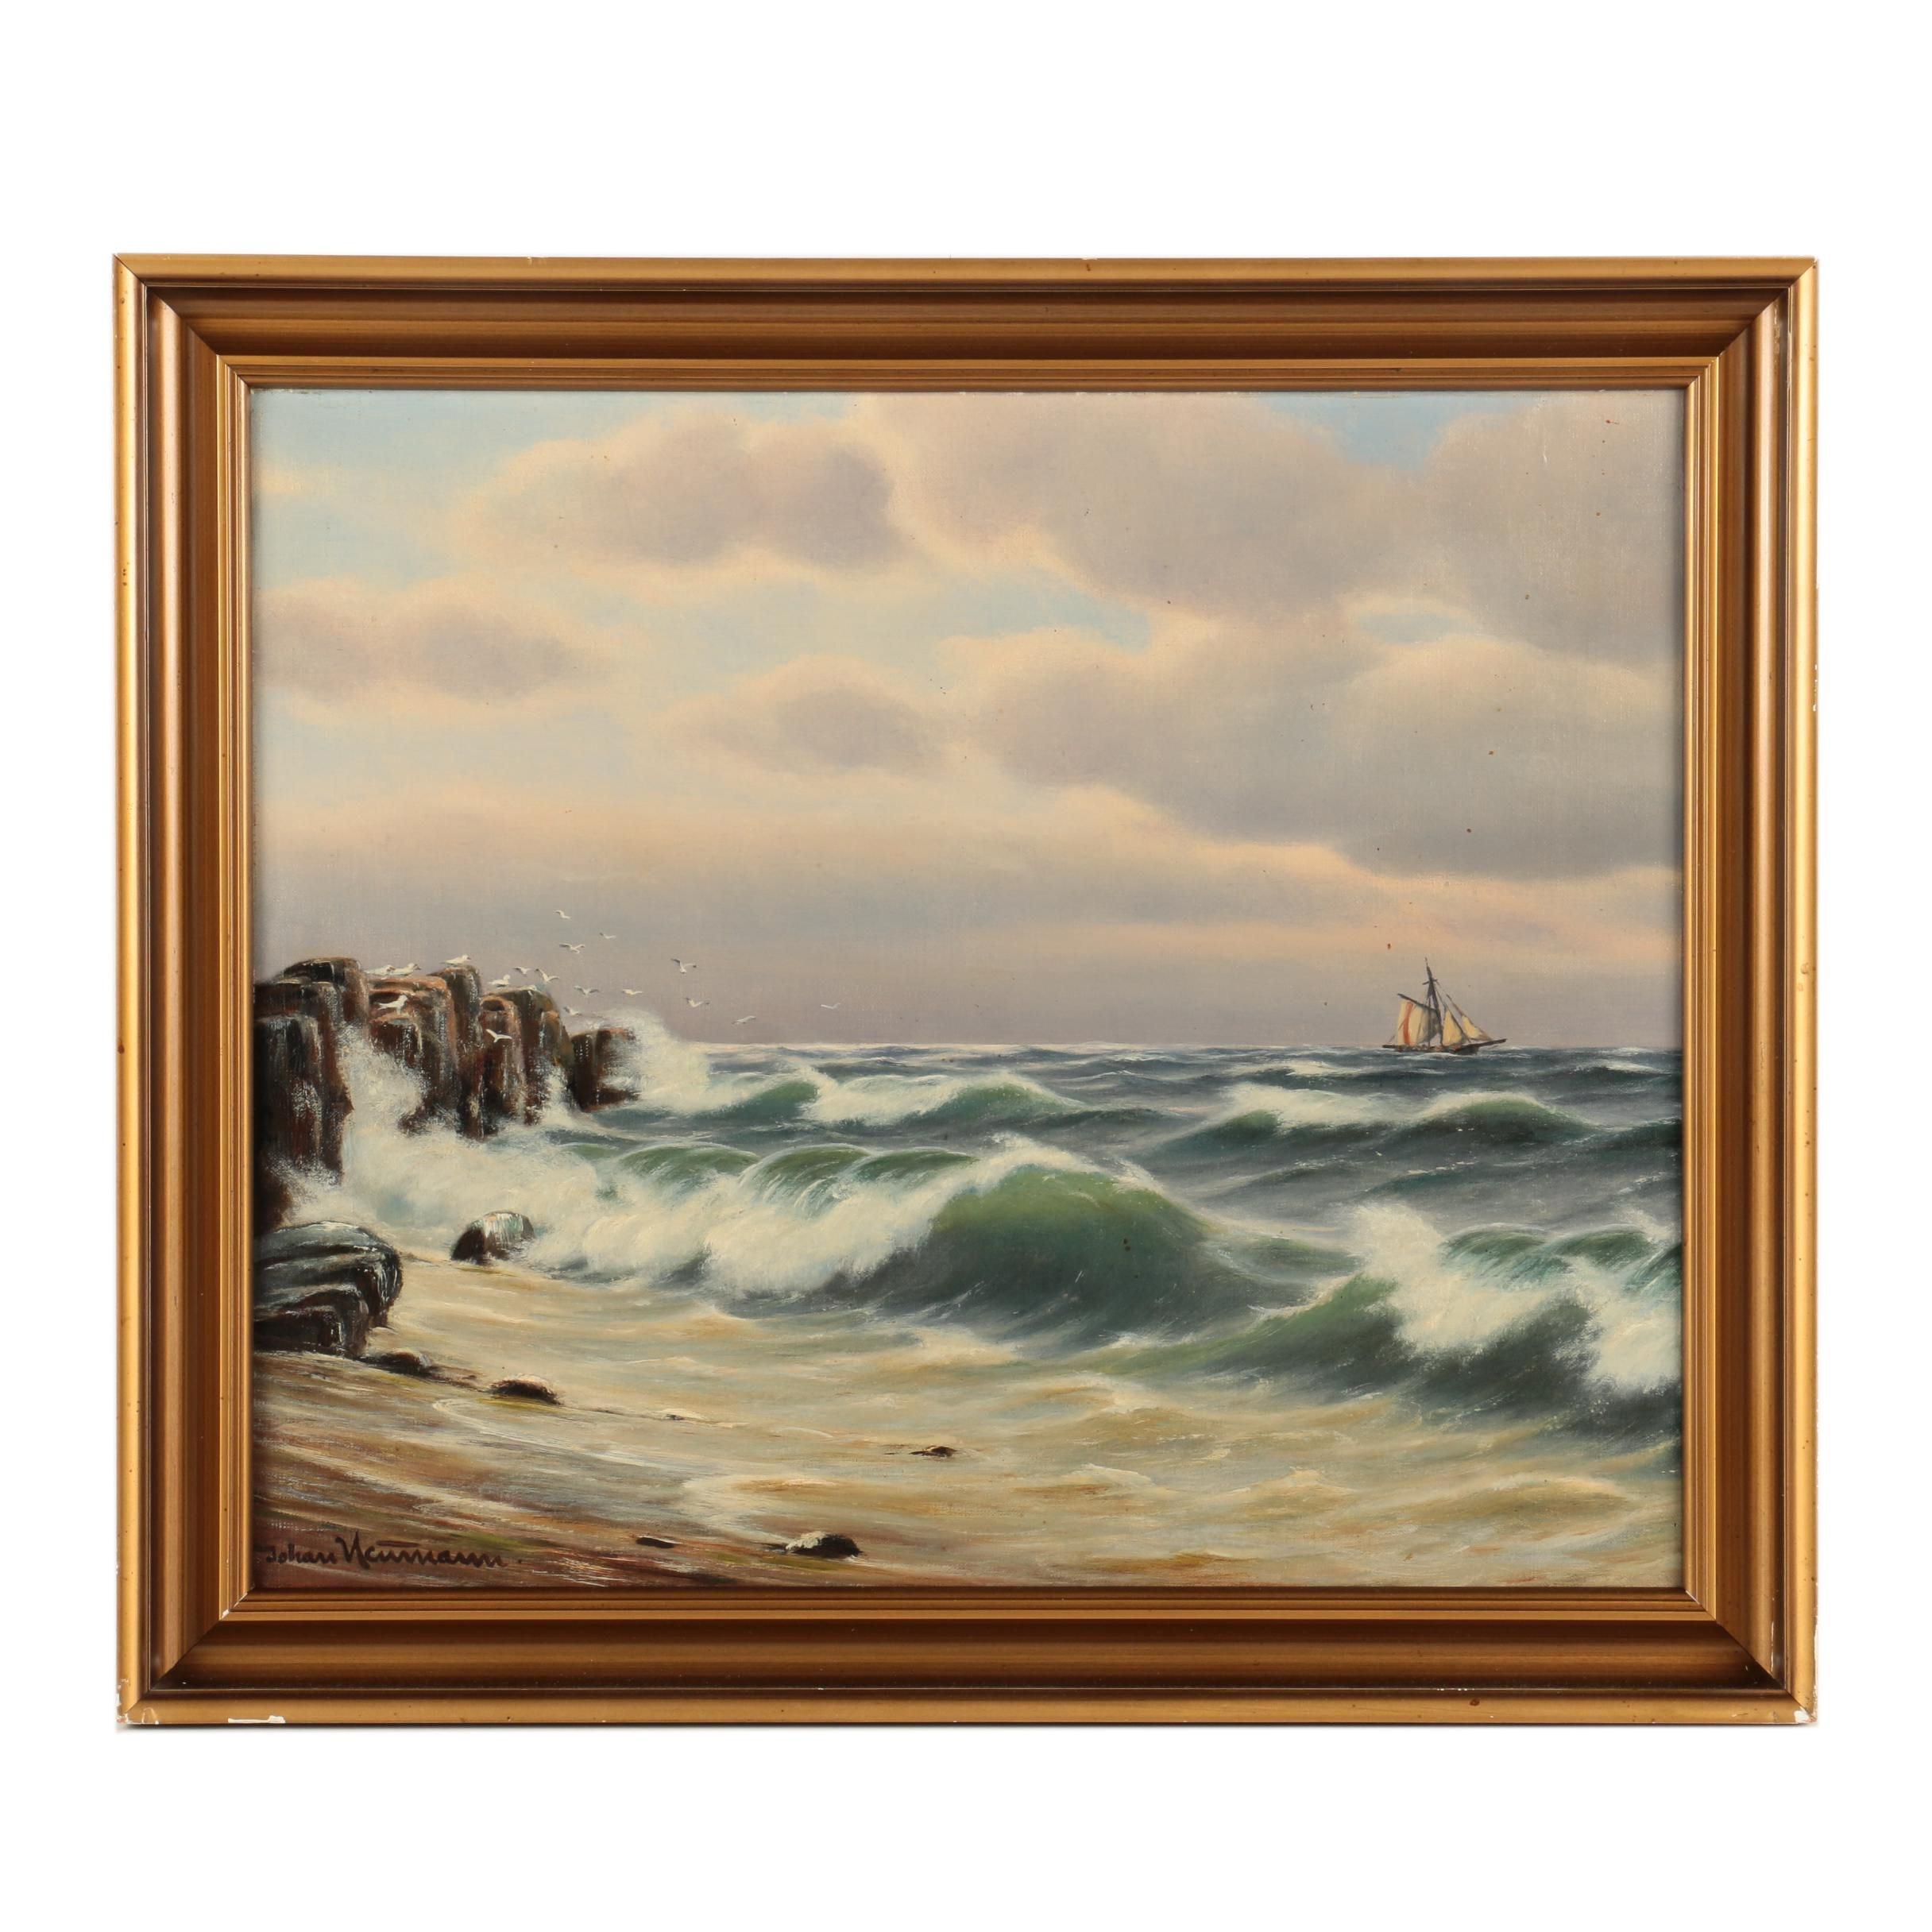 Johan Neutmann Oil Painting of a Ship at Sea